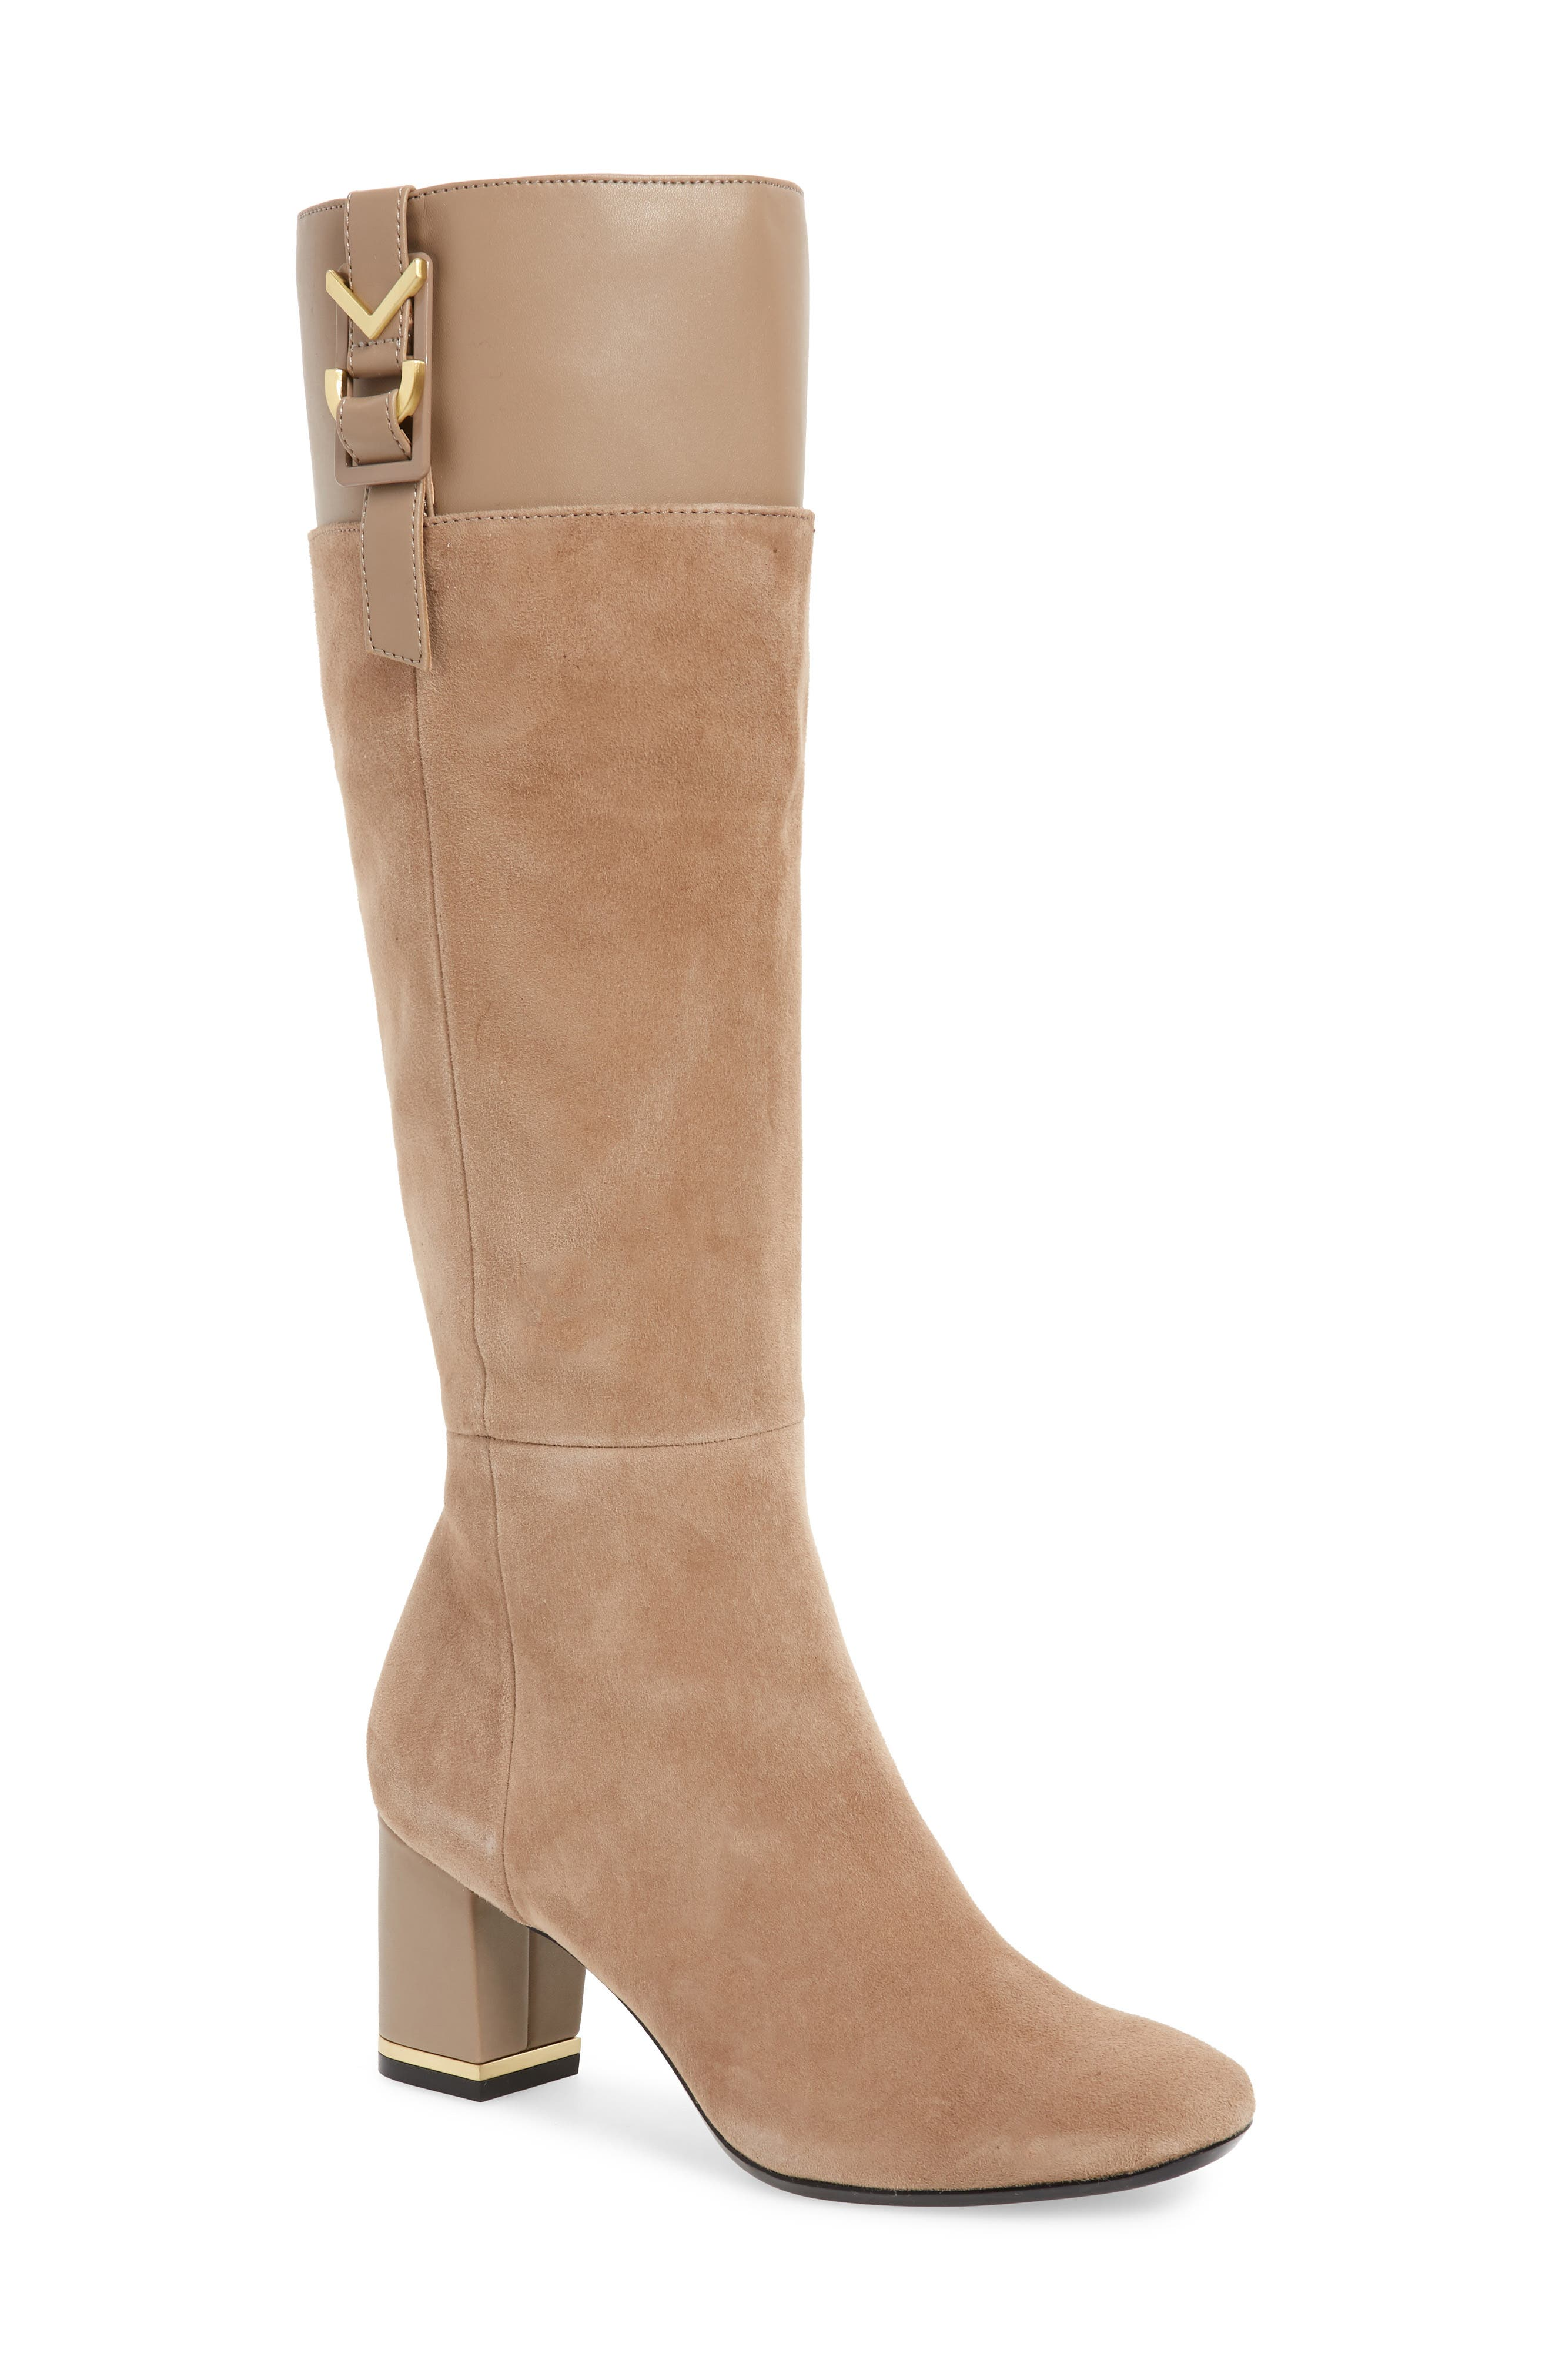 Calvin Klein Candace Knee High Boot, Brown